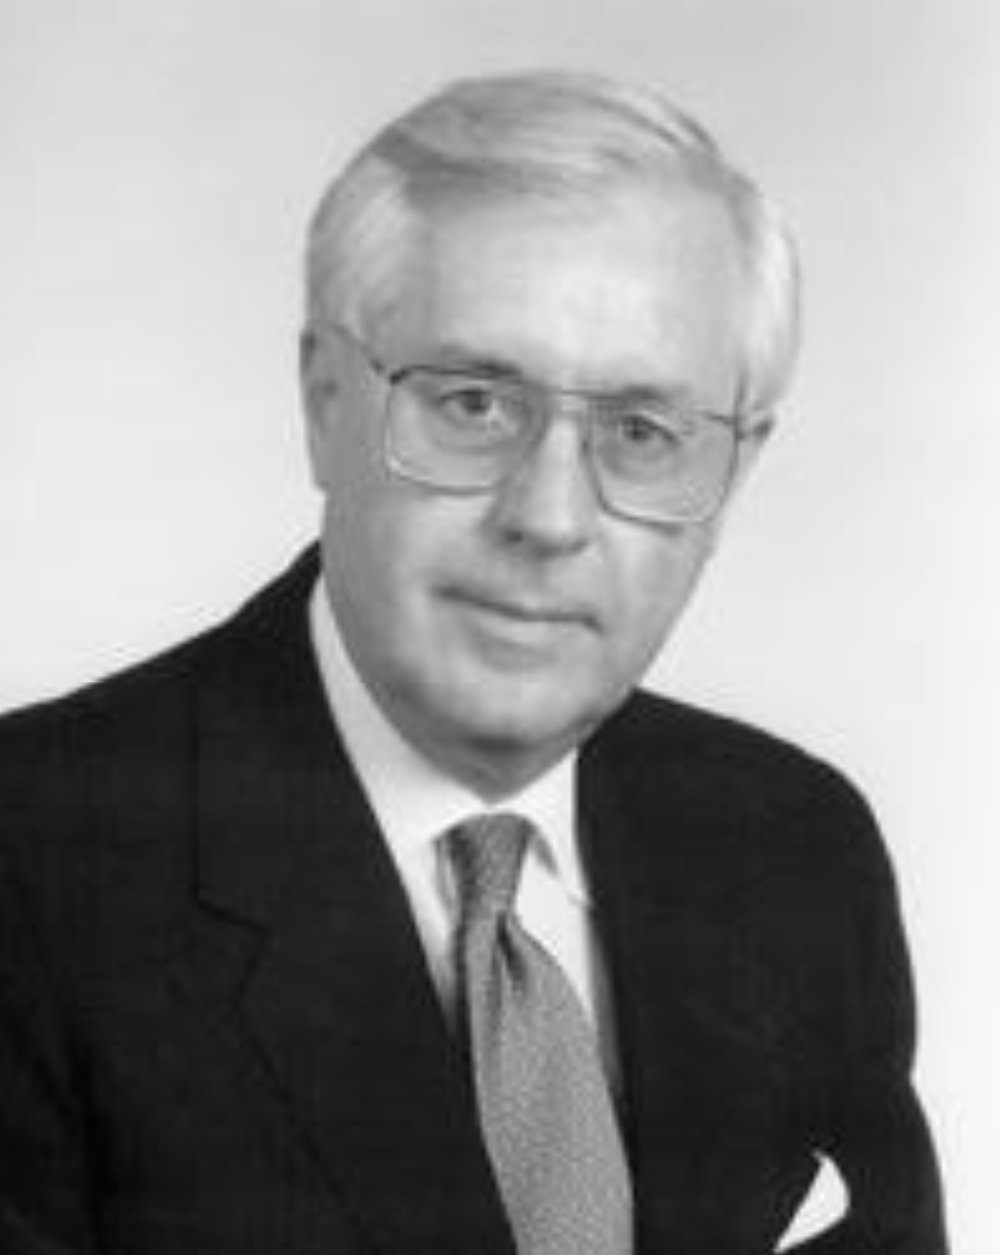 LEON C. SMITHERMAN, JR.